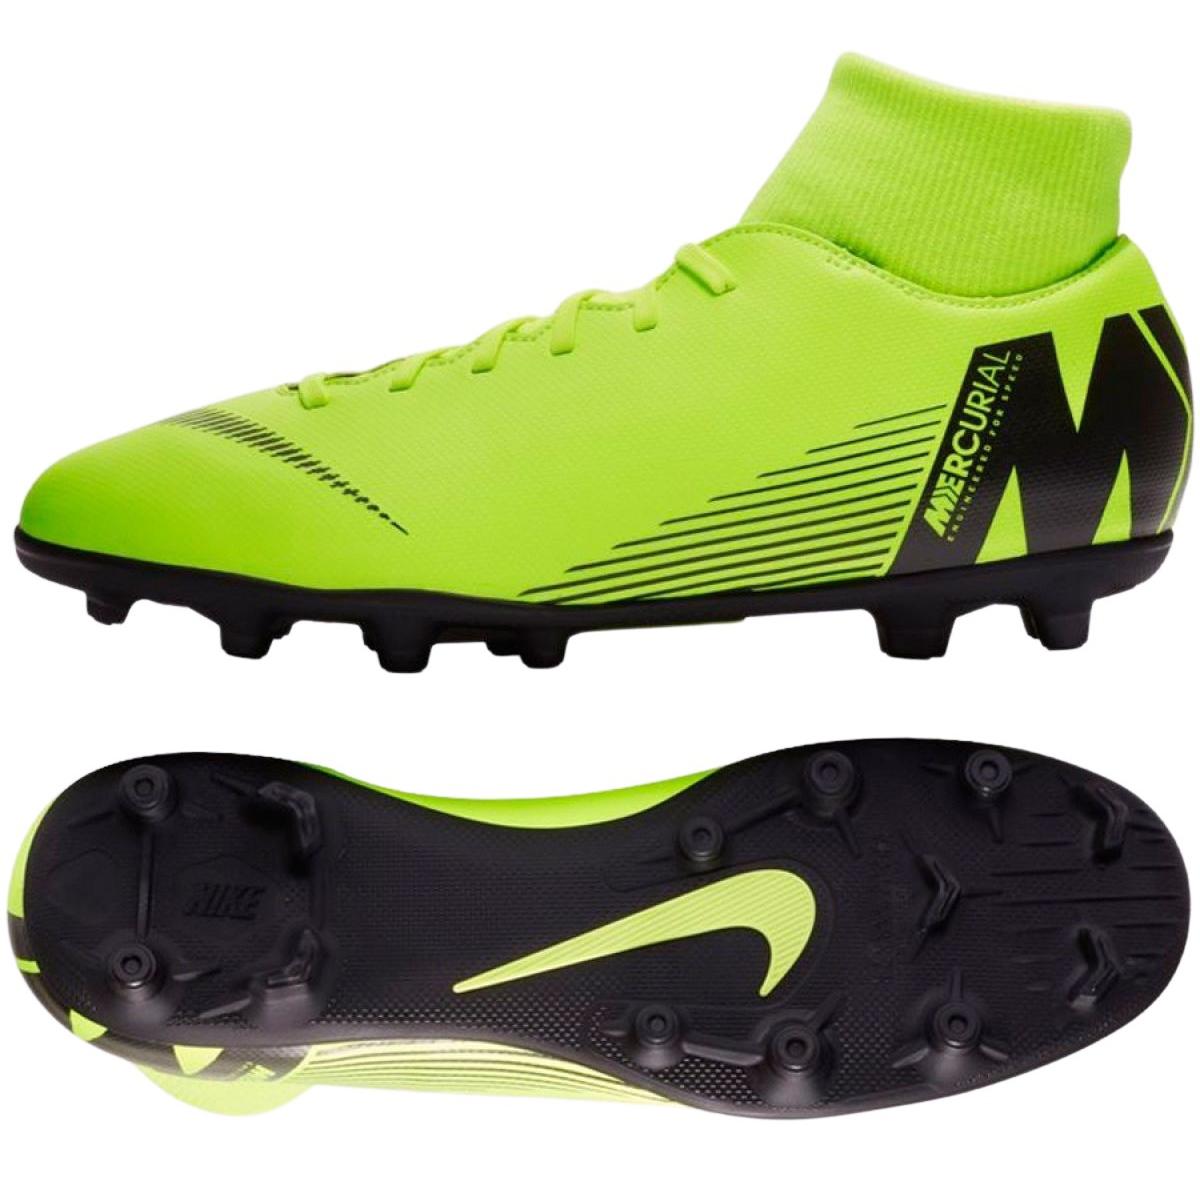 Zapatillas de fútbol Nike Mercurial Superfly 6 Club Mg M AH7363 701 verde verde